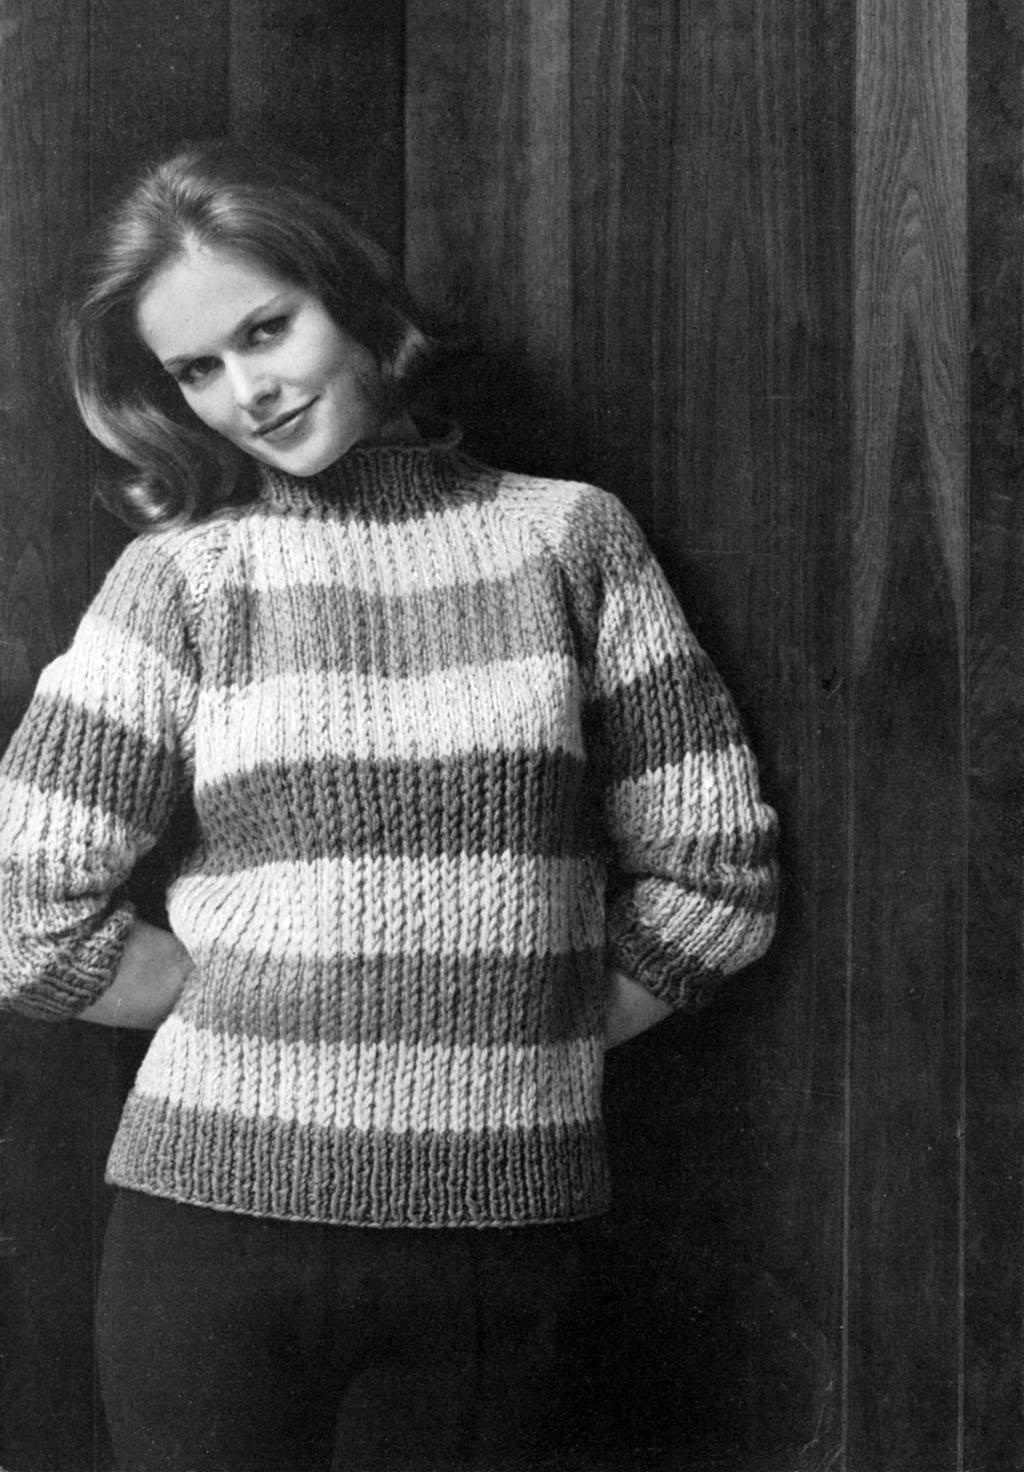 Classic Cardigan Knitting Pattern : Musings from Marilyn   Rah Rah Stripes! Vintage 60s Sweater Knitting Pattern